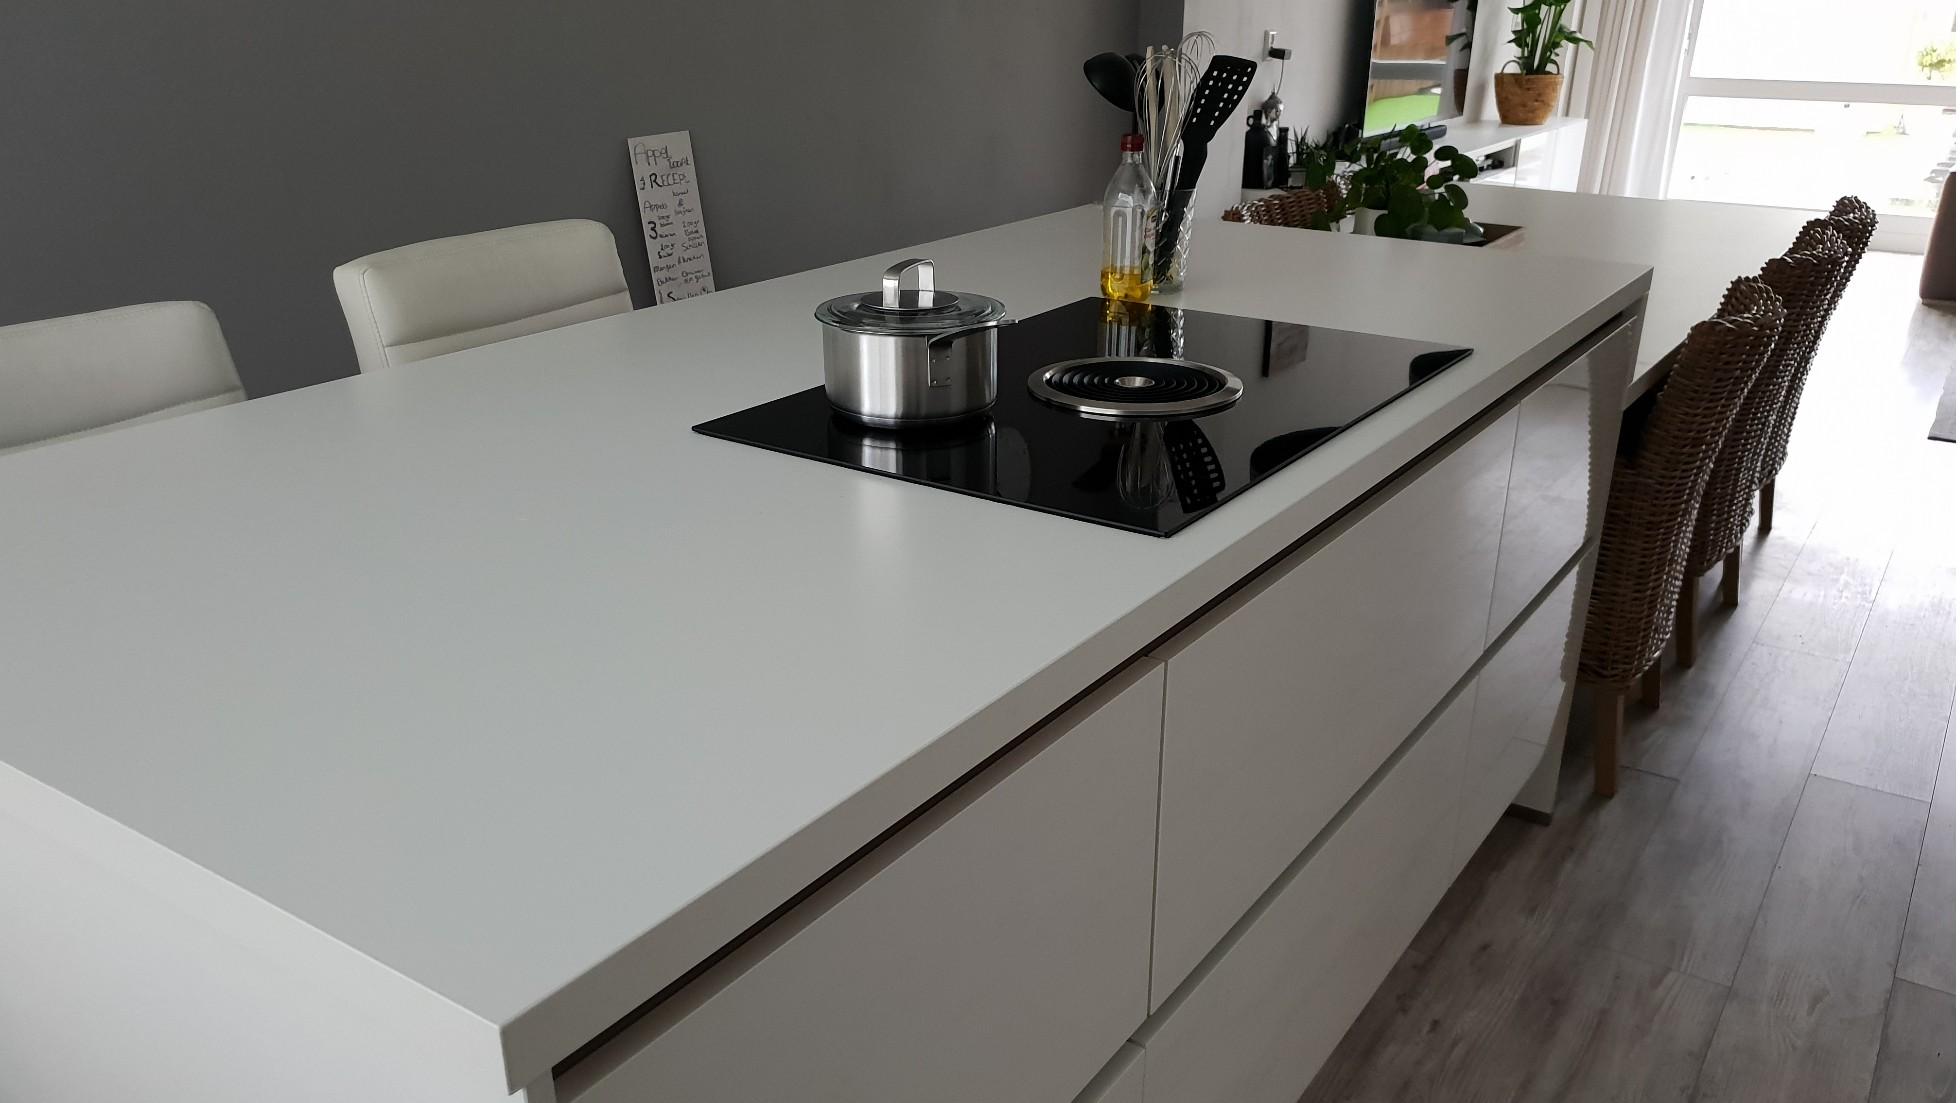 Mooie Witte Keuken : Erg mooie witte keuken vasco keukens